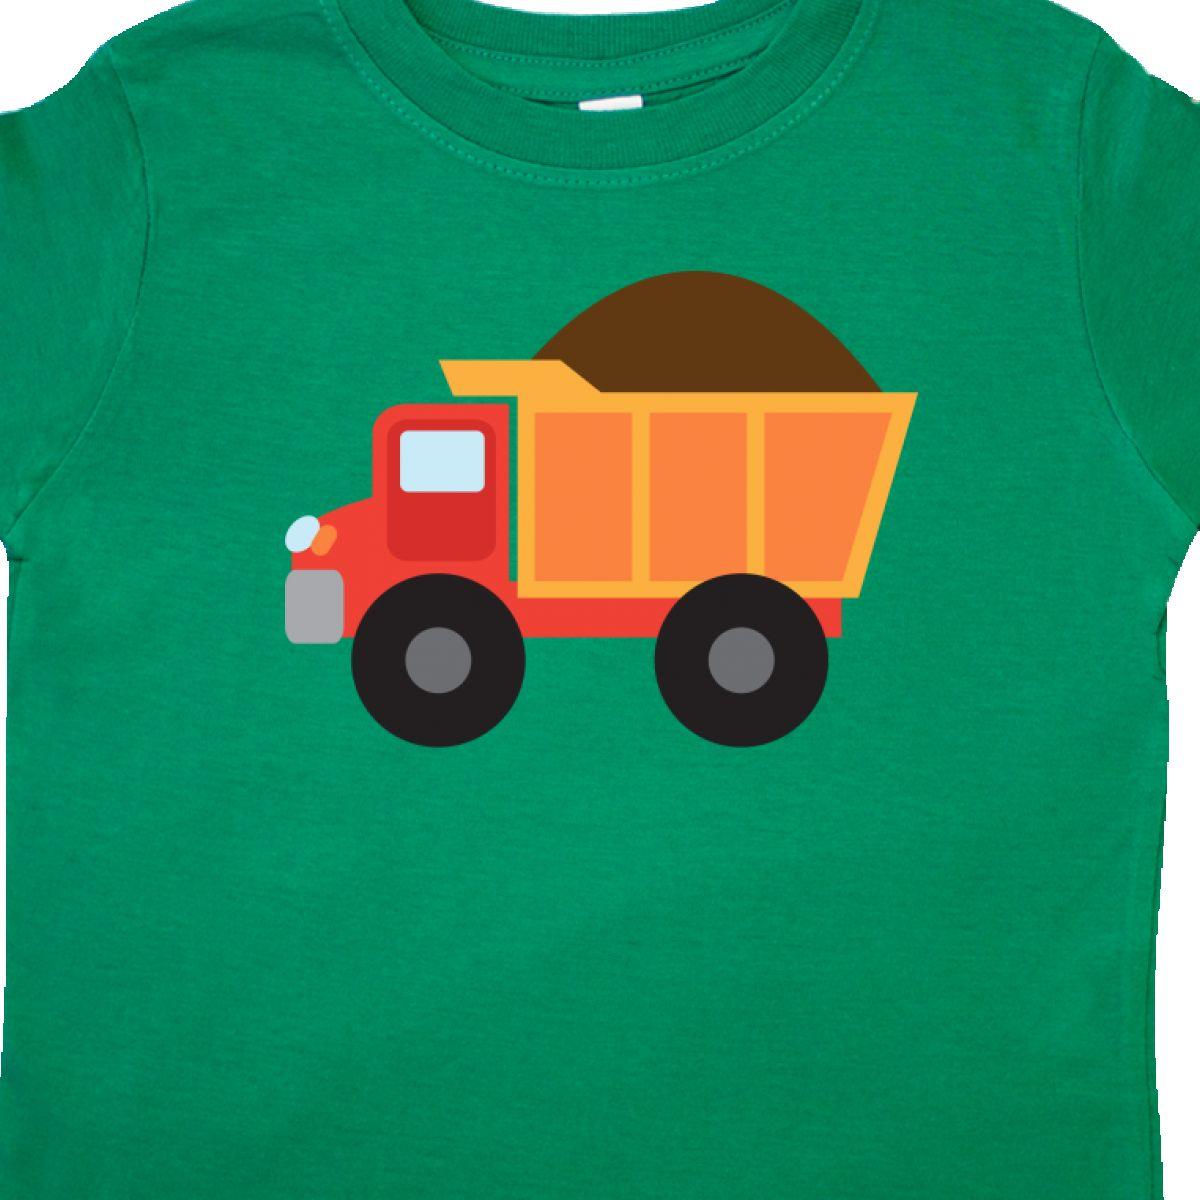 Inktastic-Work-Truck-Construction-Vehicle-Toddler-T-Shirt-Trucks-Vehicles-Cute thumbnail 14